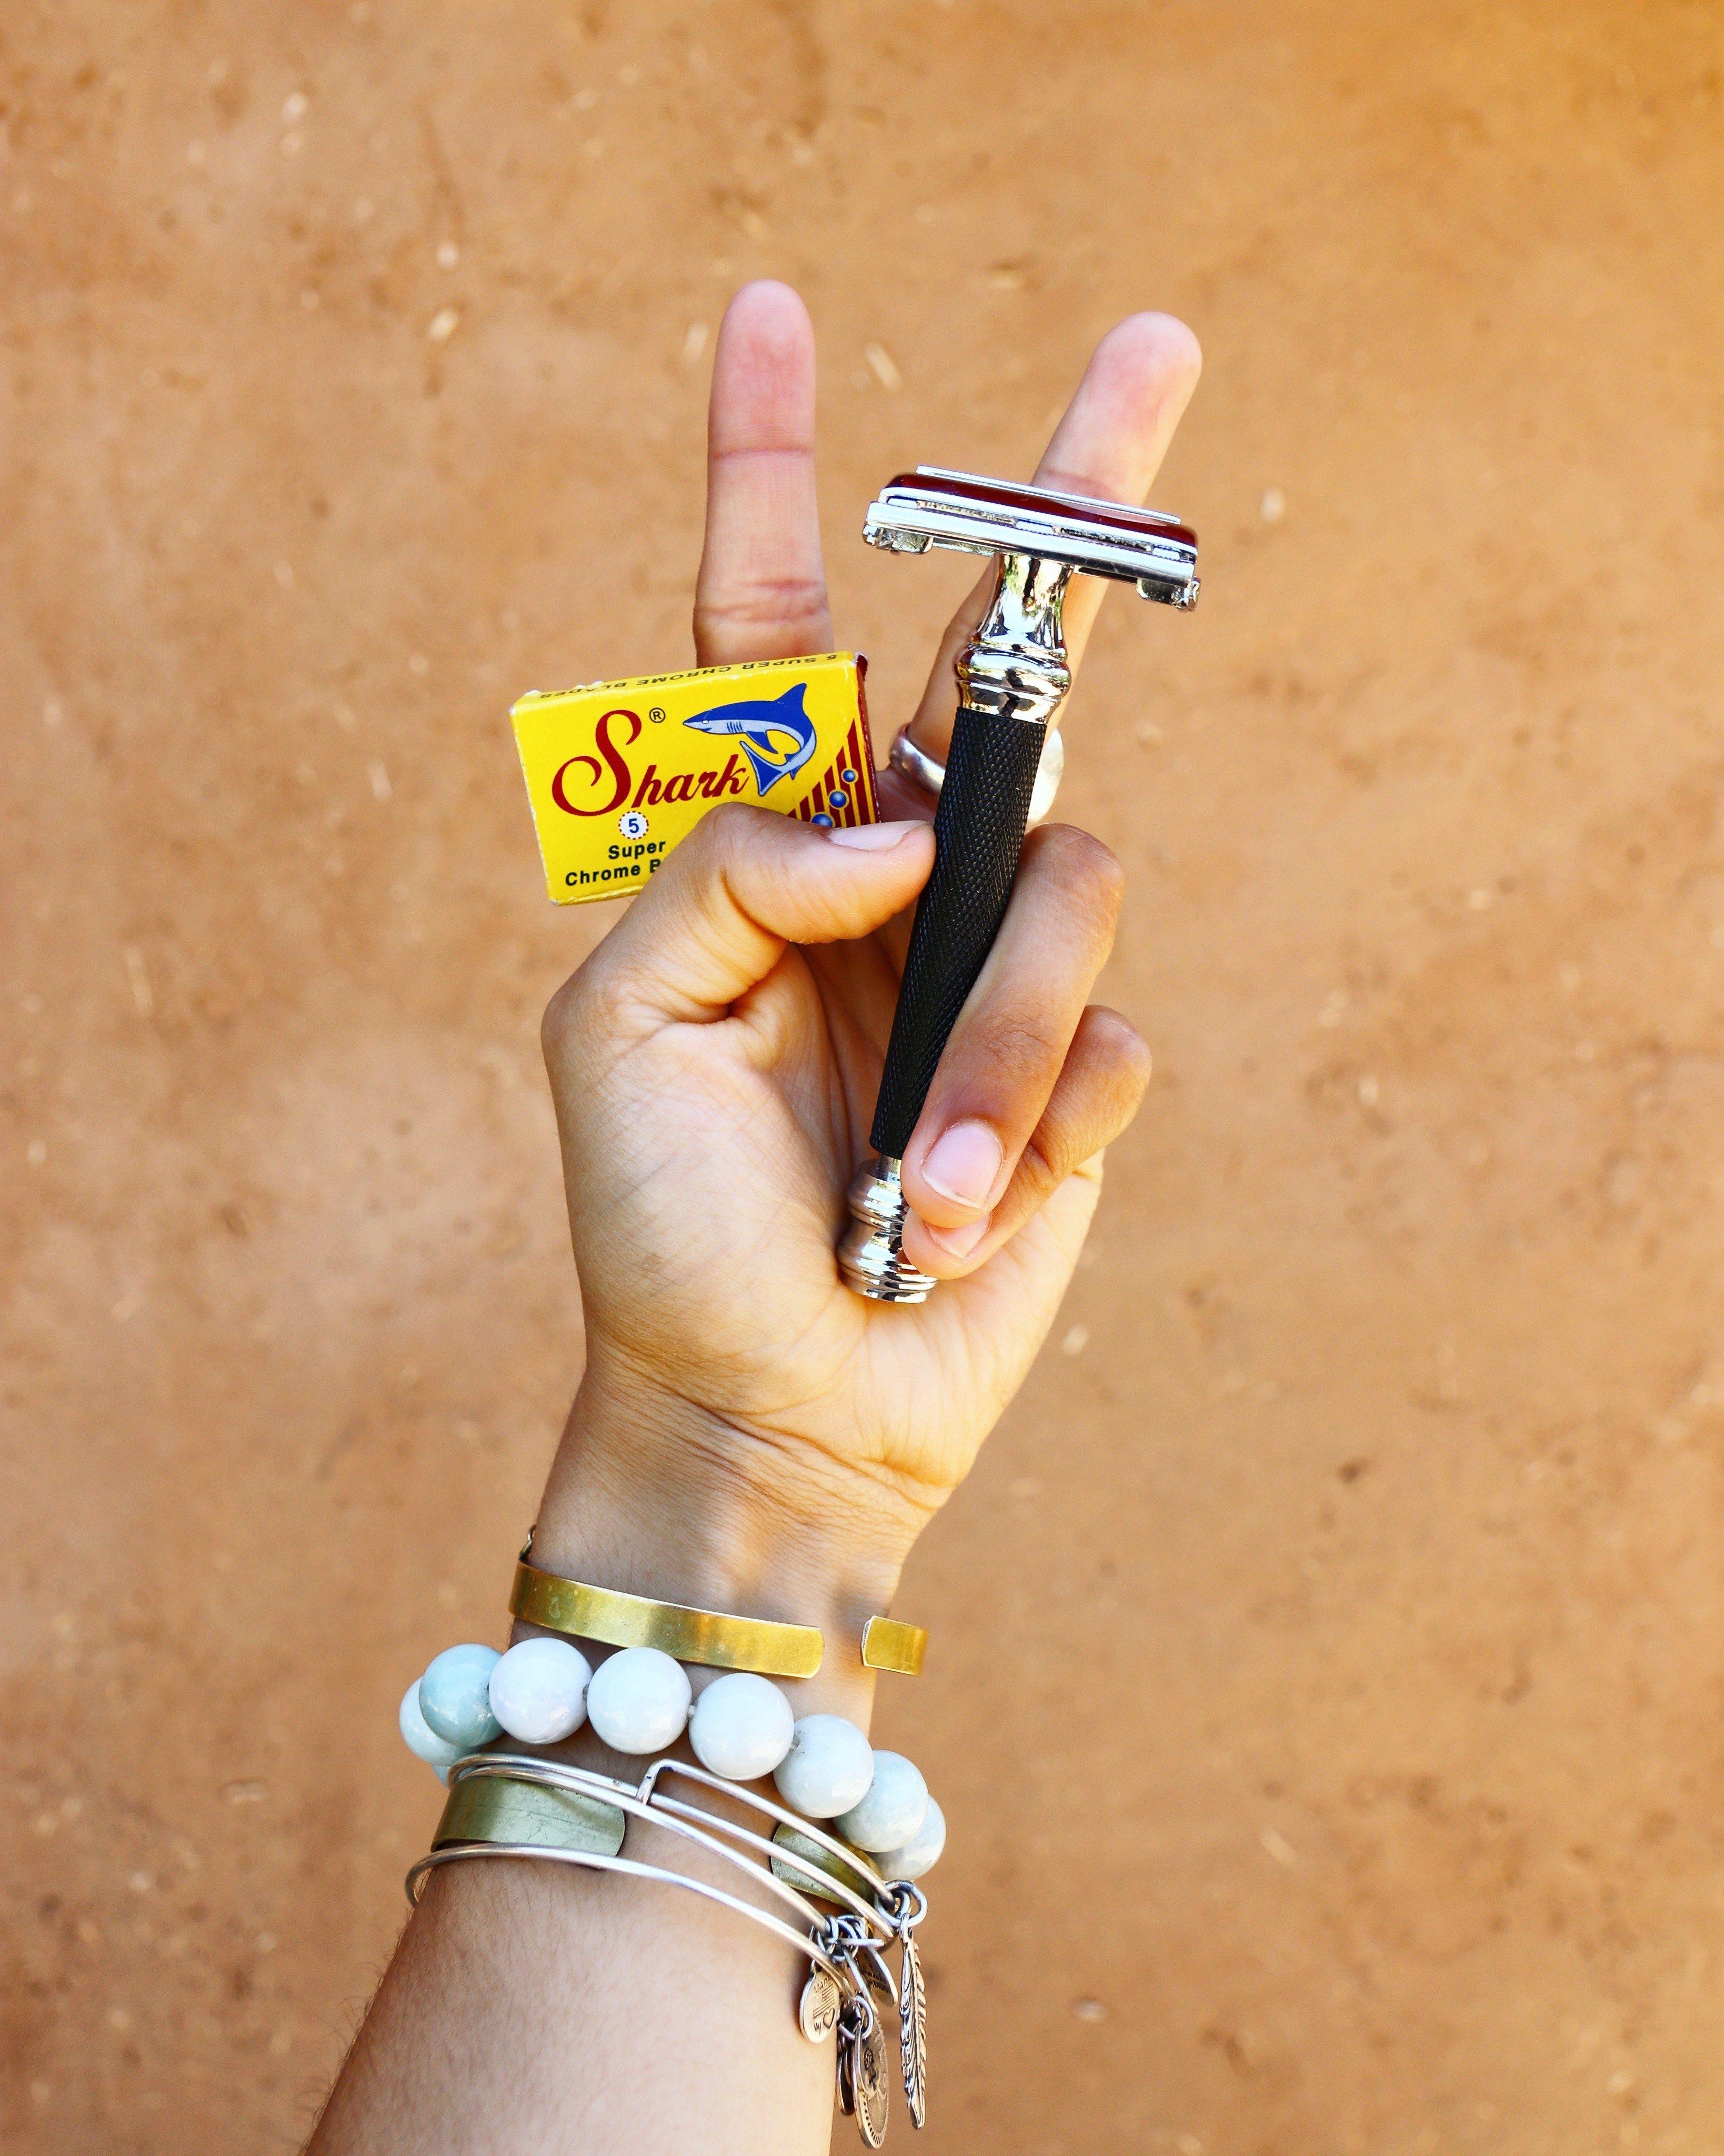 How to use a safety razor zero waste shaving safety